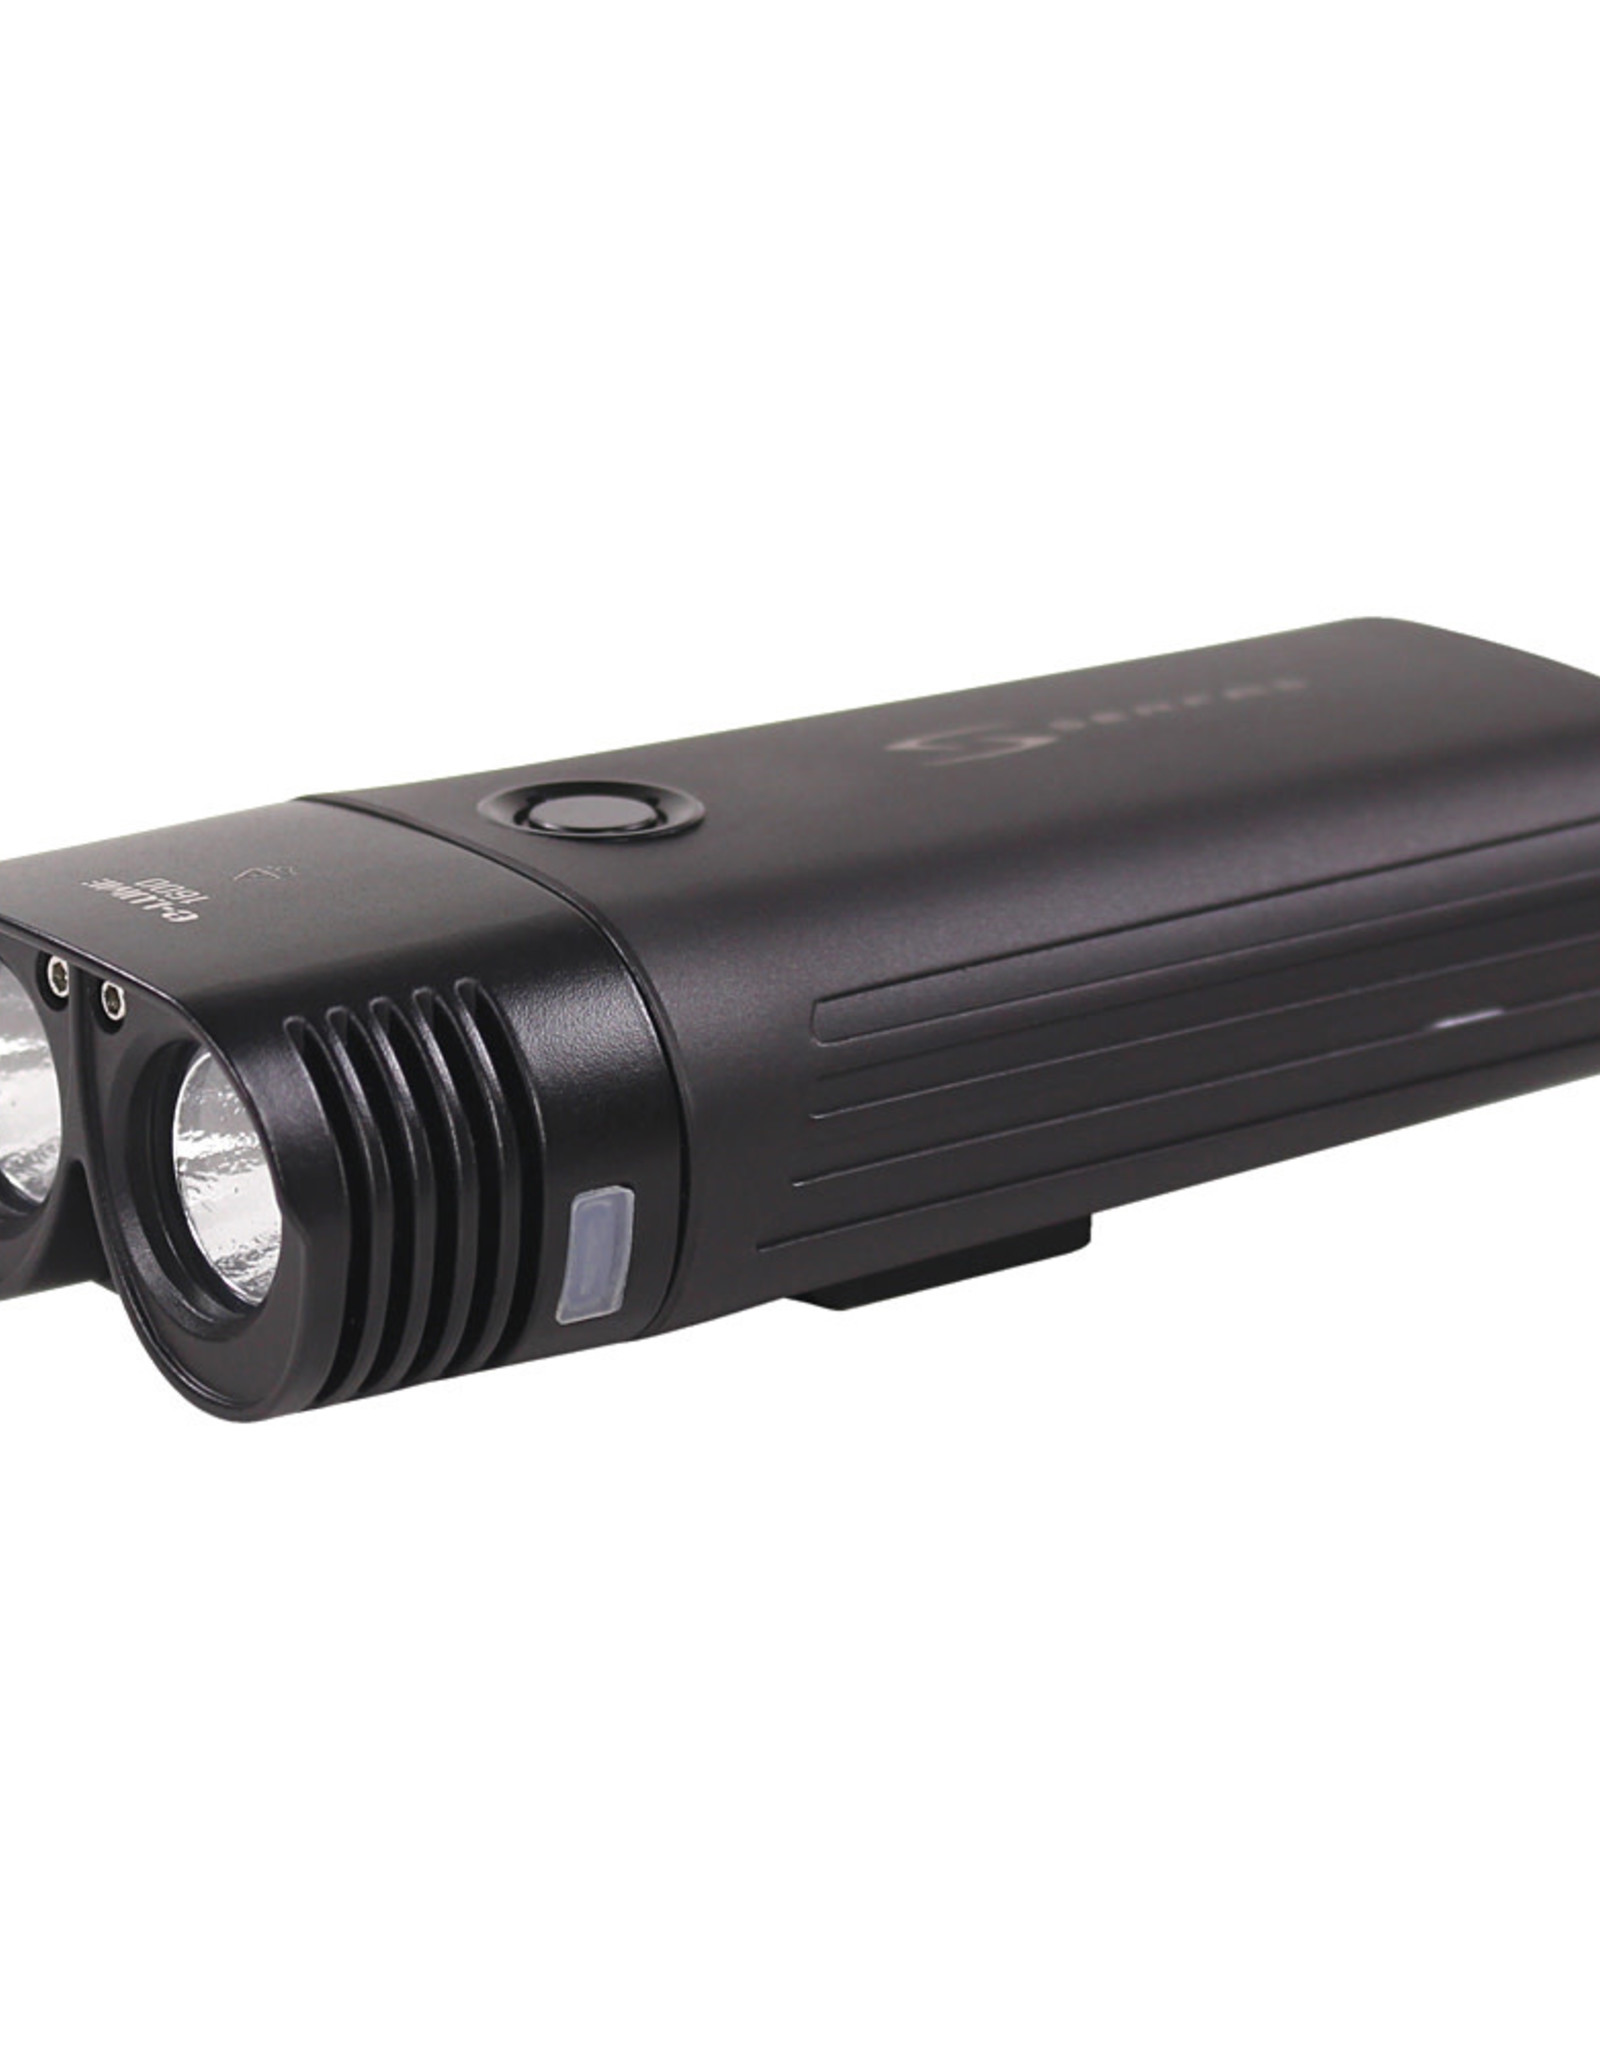 SERFAS USB E-LUME 1600 Front Light